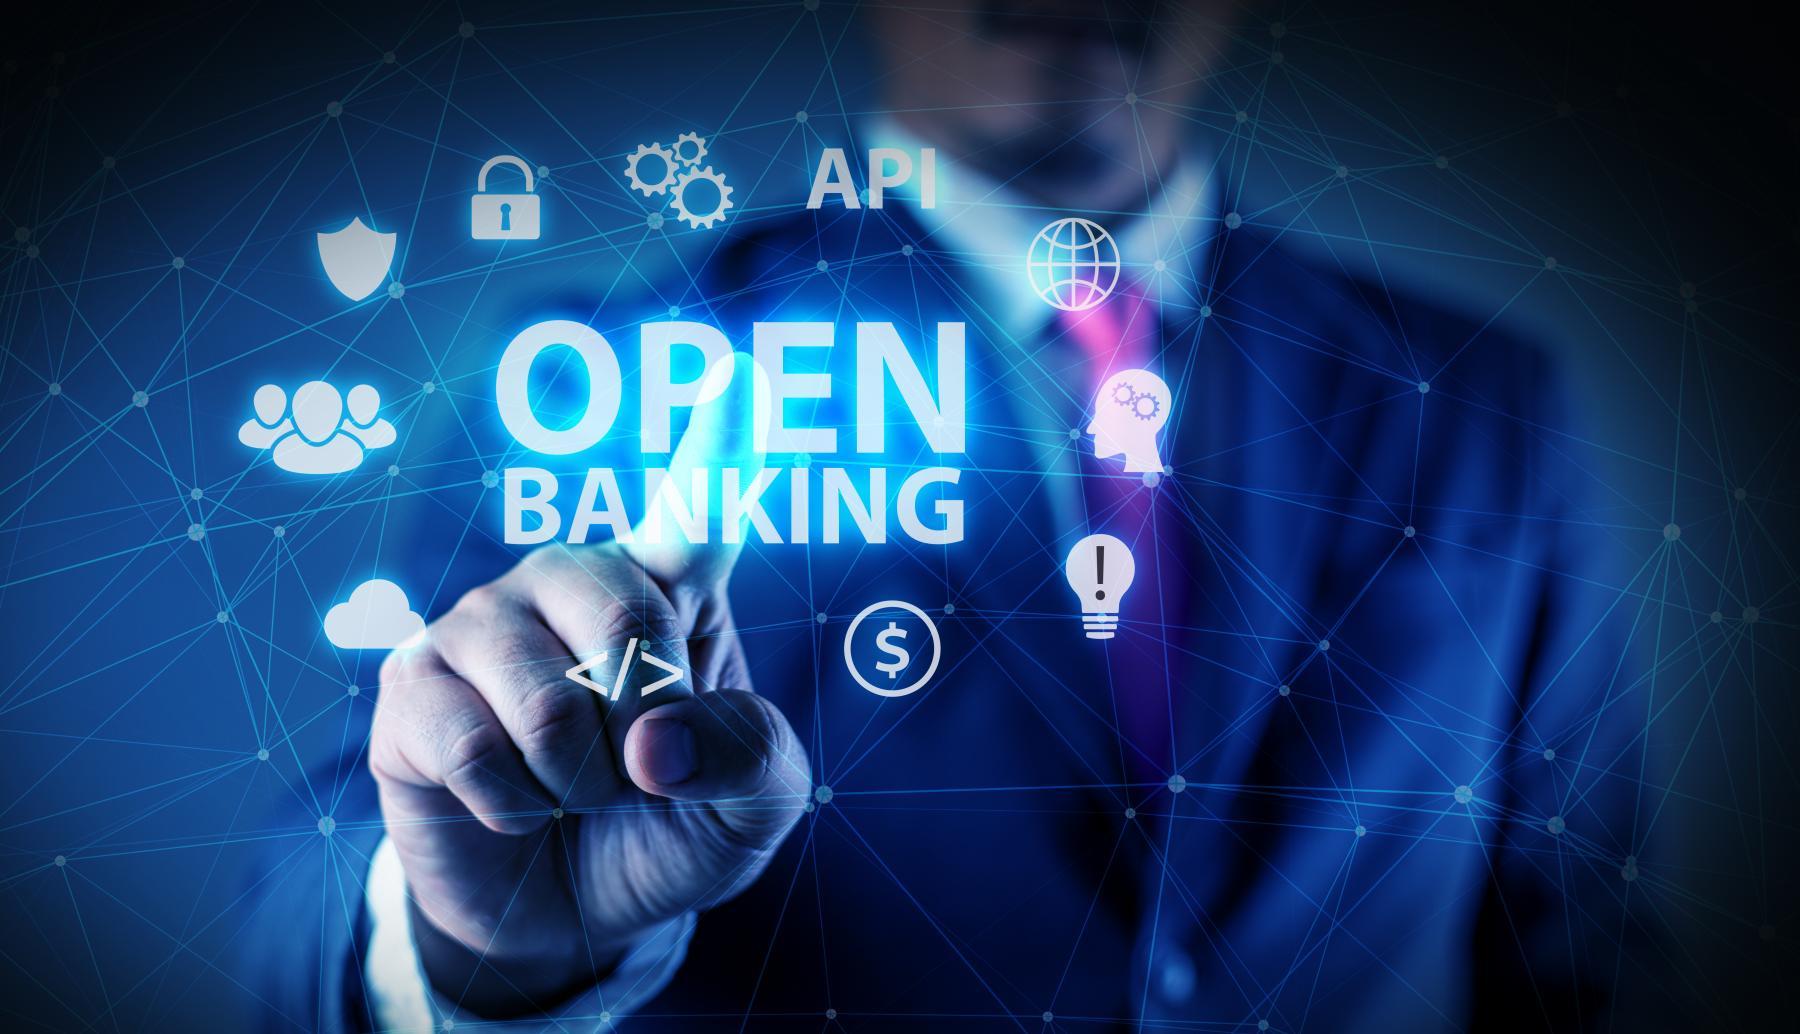 Open banking makes its way in America despite little regulatory momentum